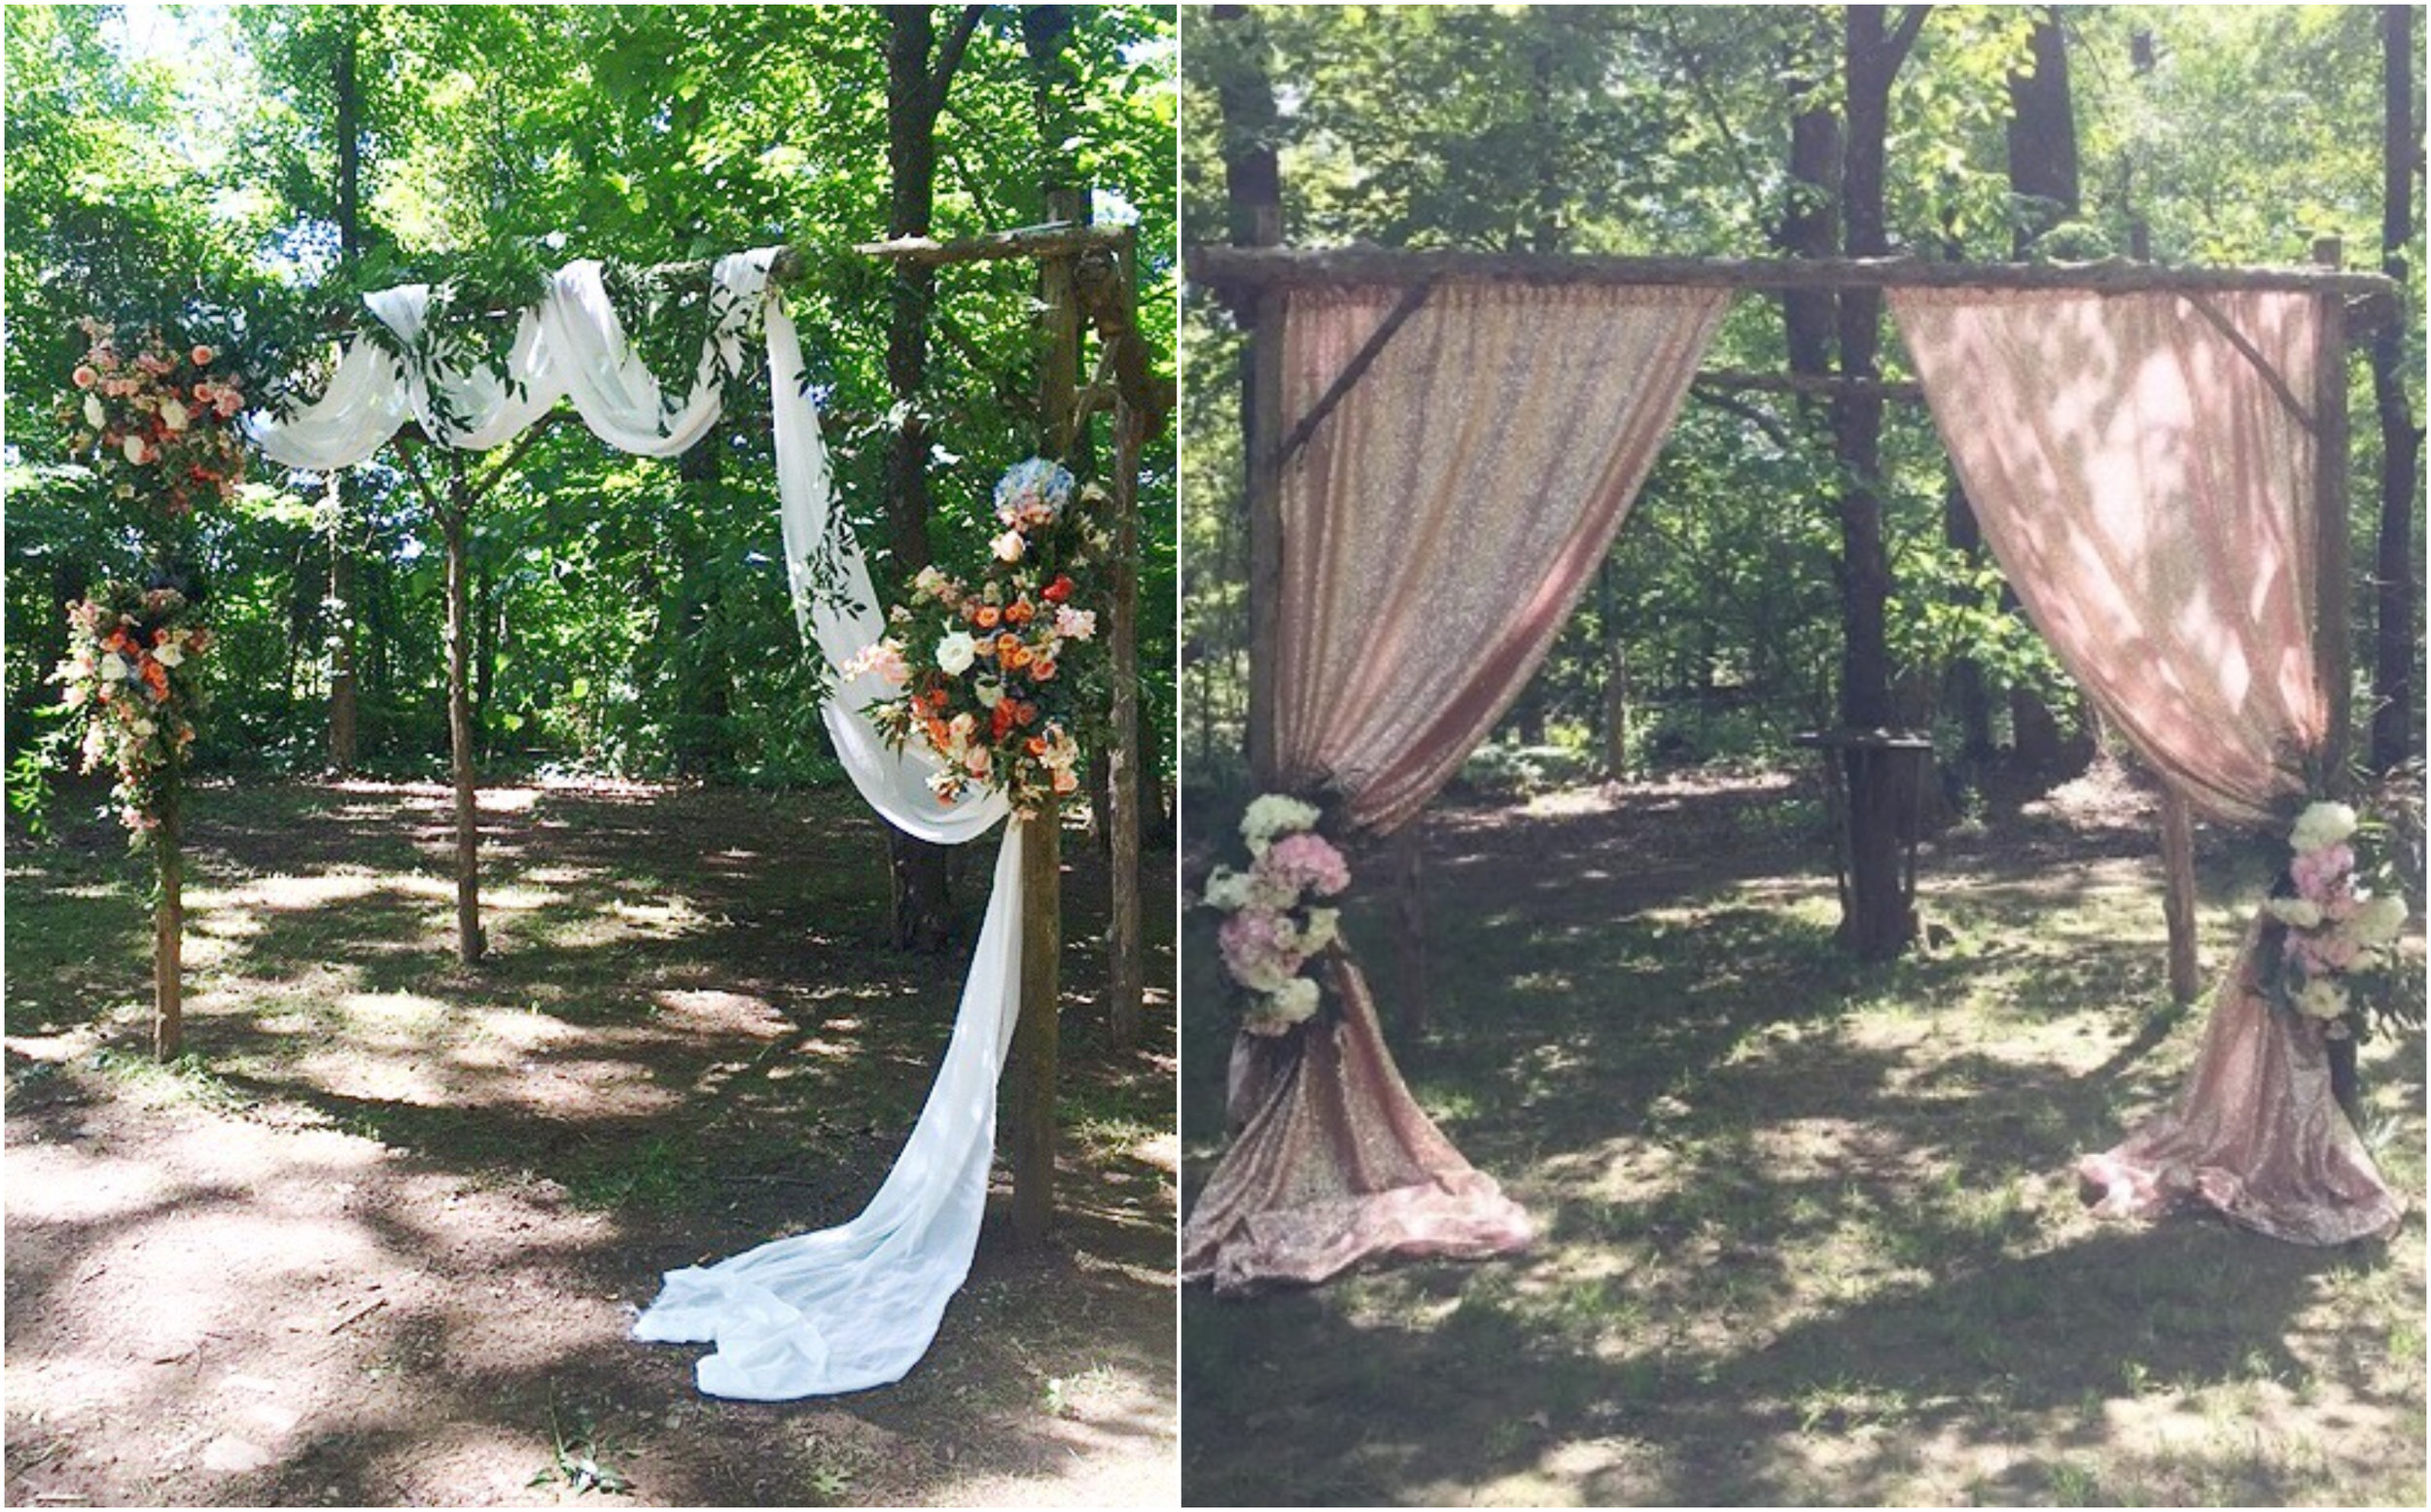 From Sydney + Michael's wedding and Katy + Tyler's wedding